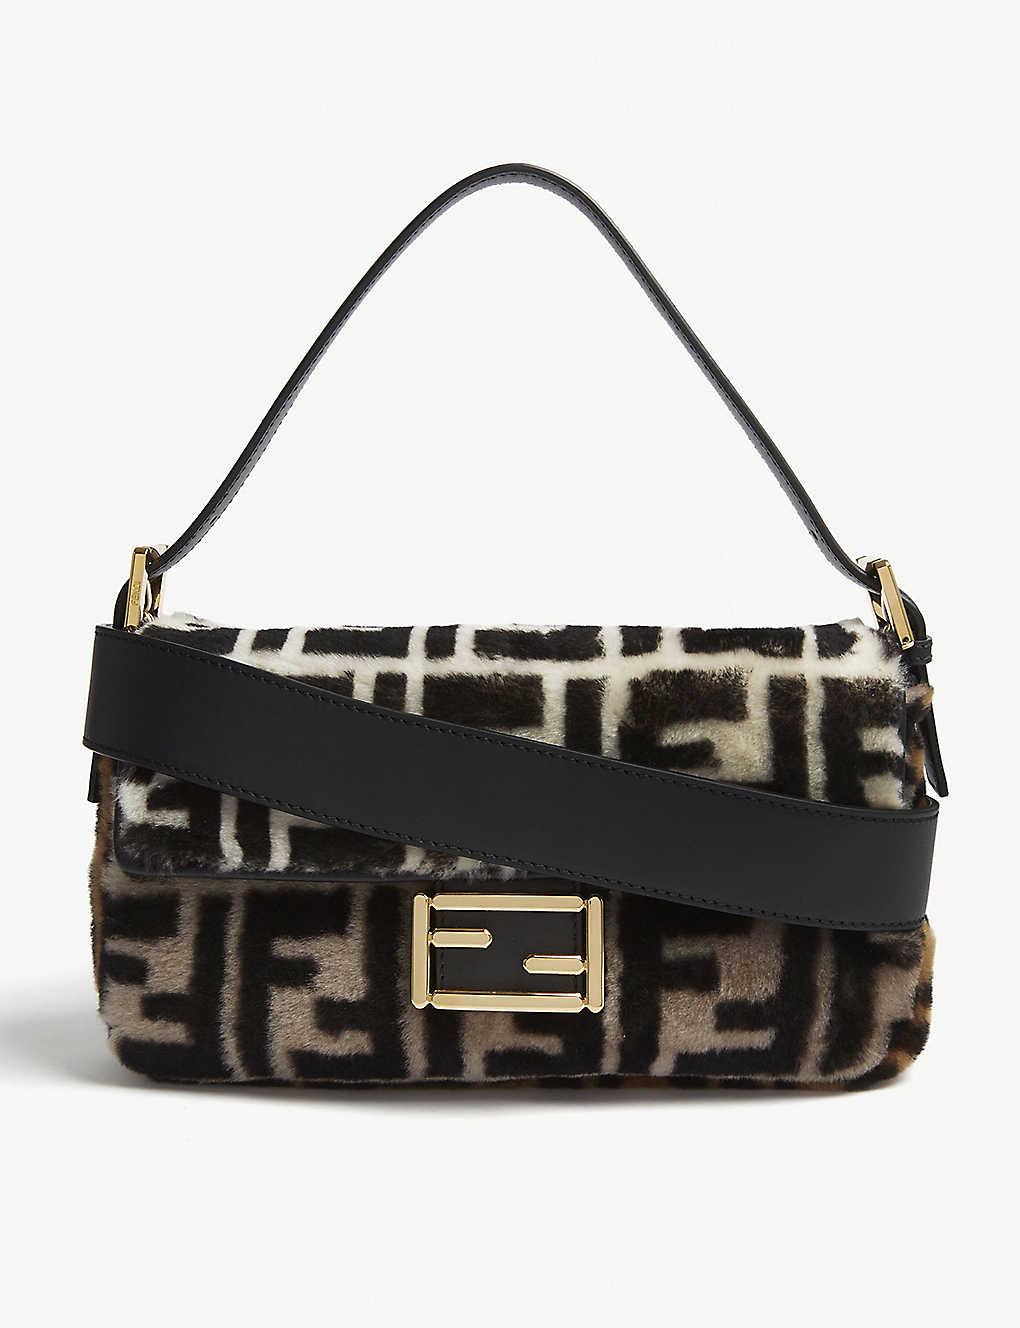 FENDI - Logo shearling baguette shoulder bag  60154734ba4ac